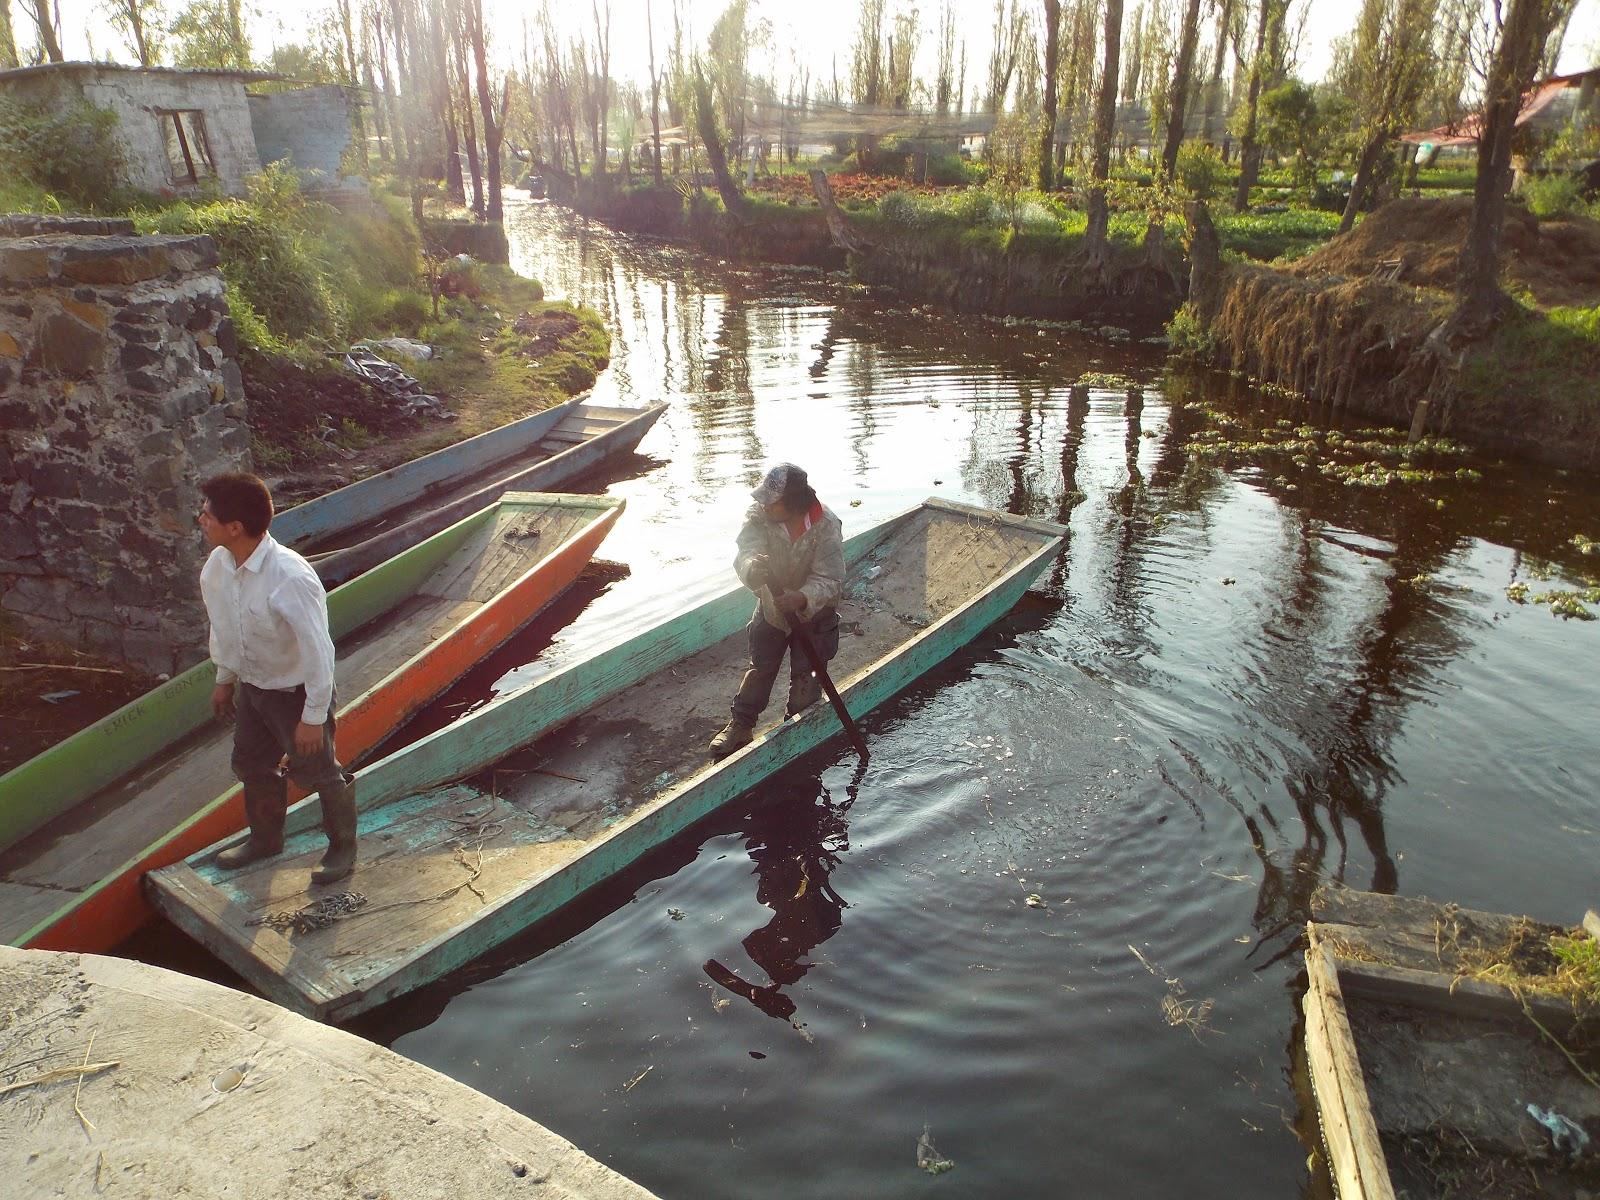 Canales de Xochimilco al atardecer